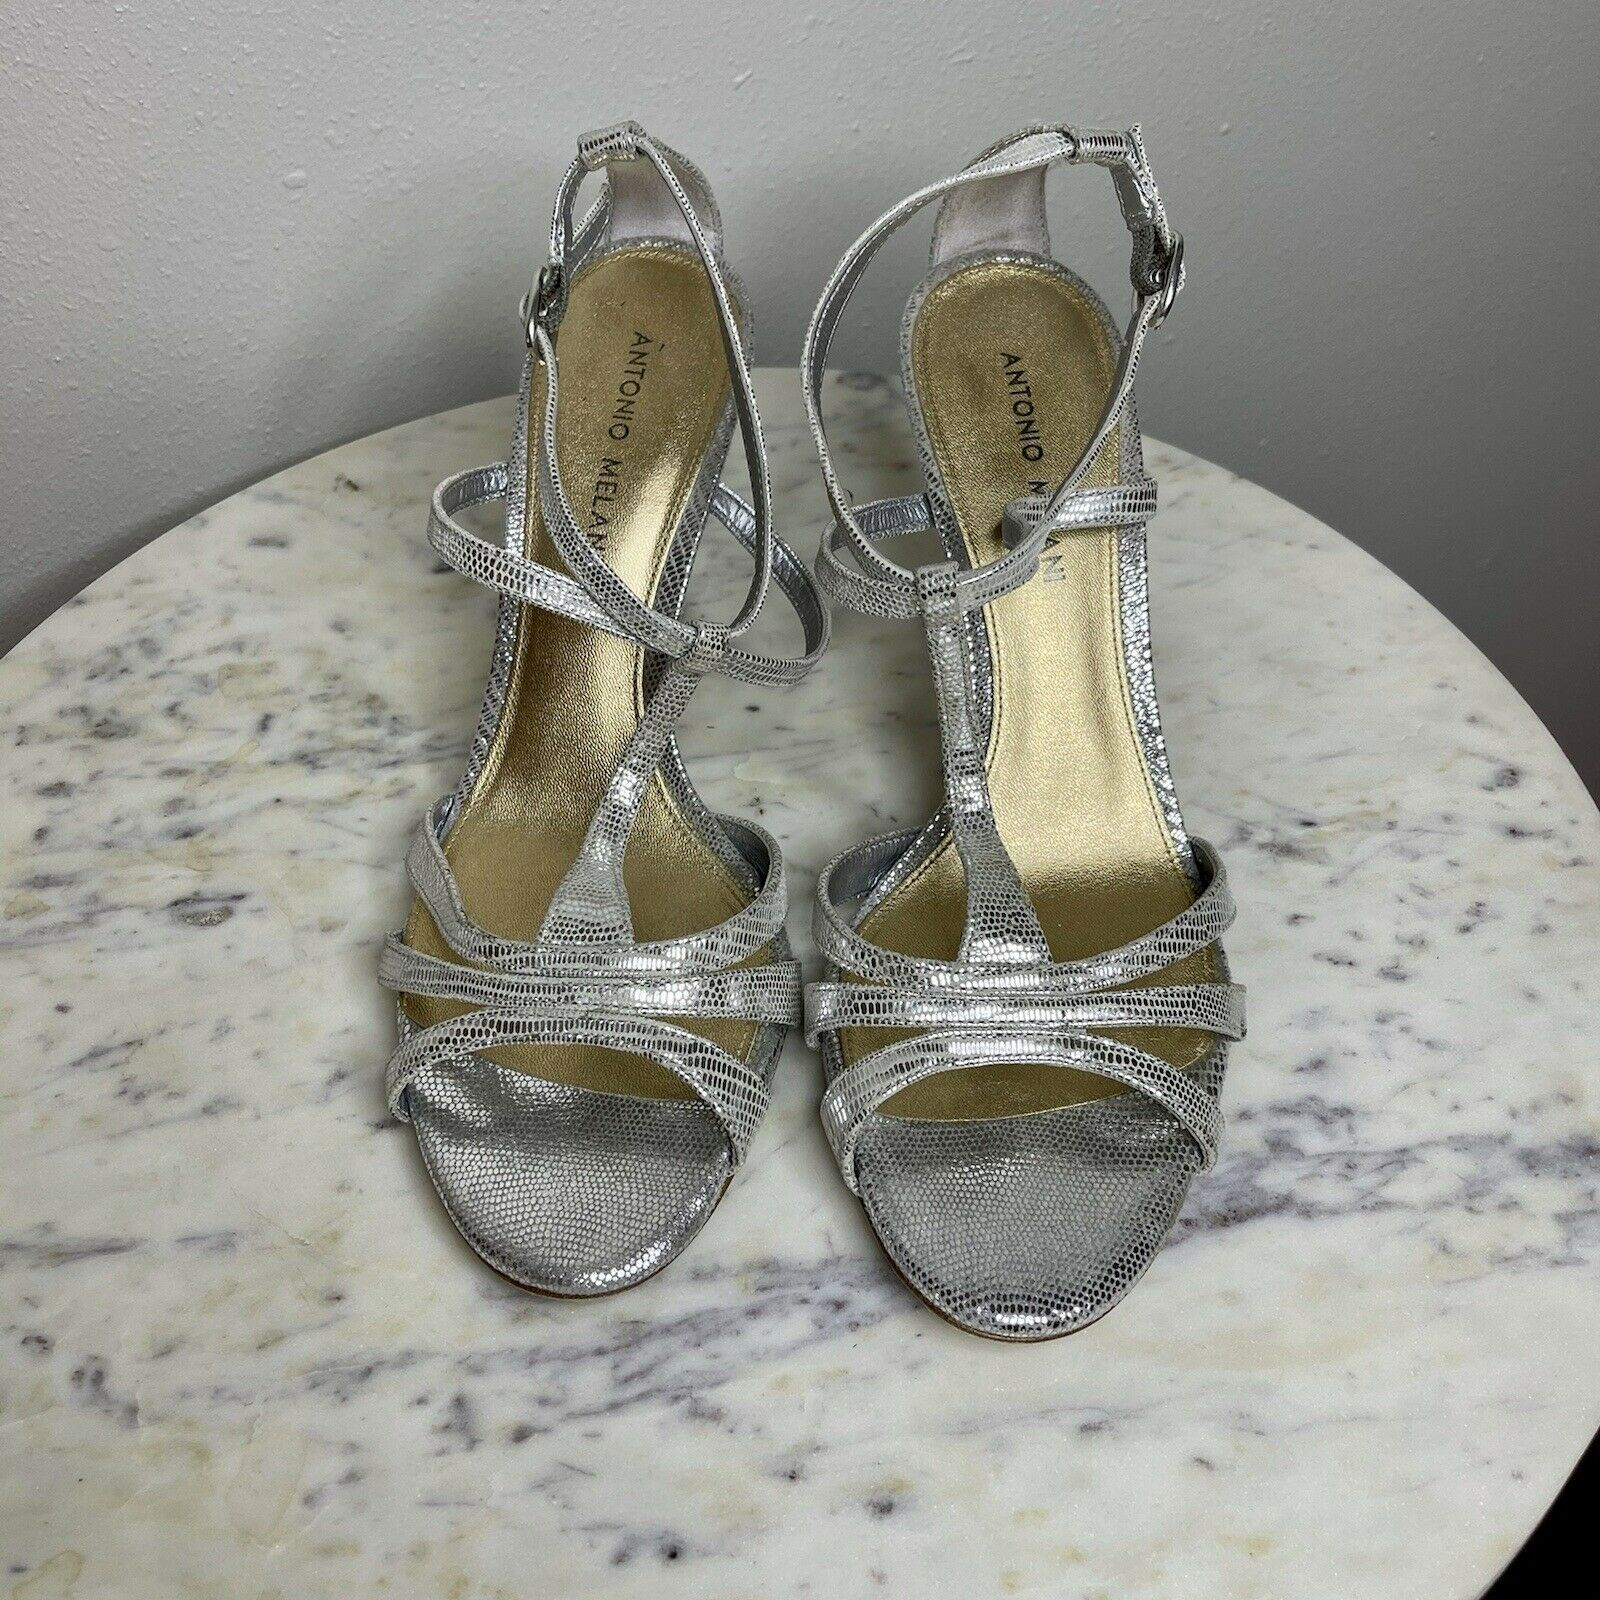 Antonio Melani Sz 9.5 M Leather Silver Sandals Heels Strappy Metallic -R1